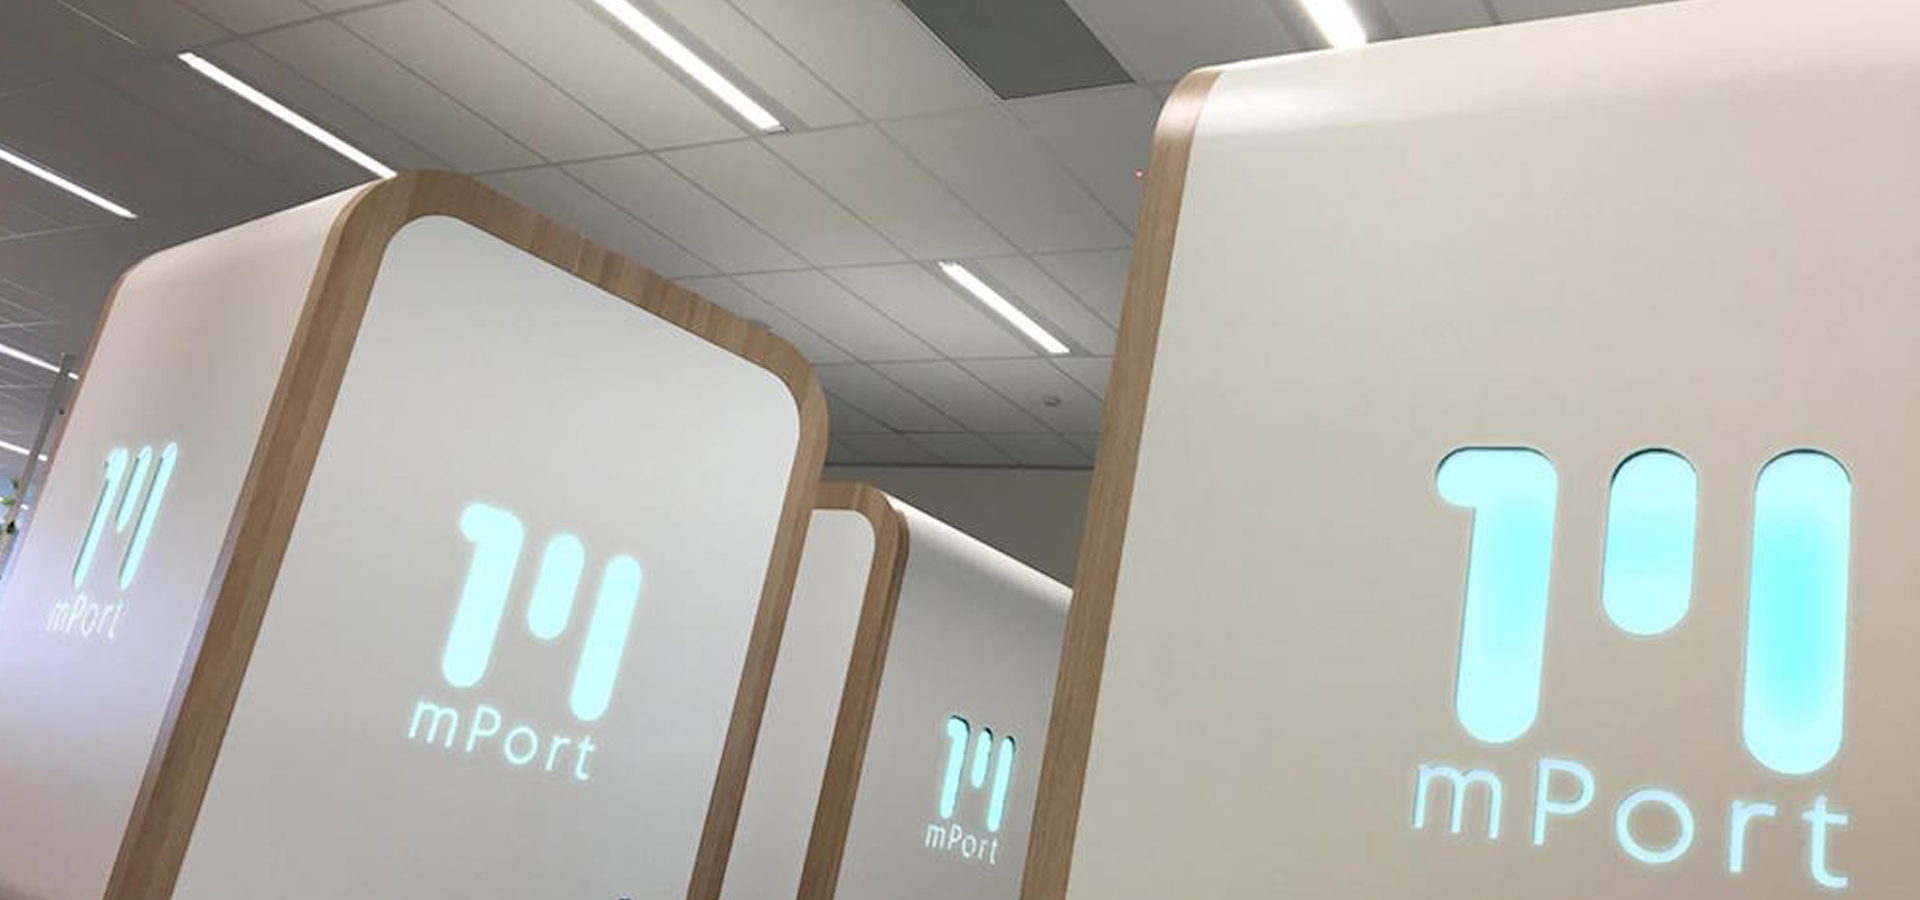 mPort body scanner